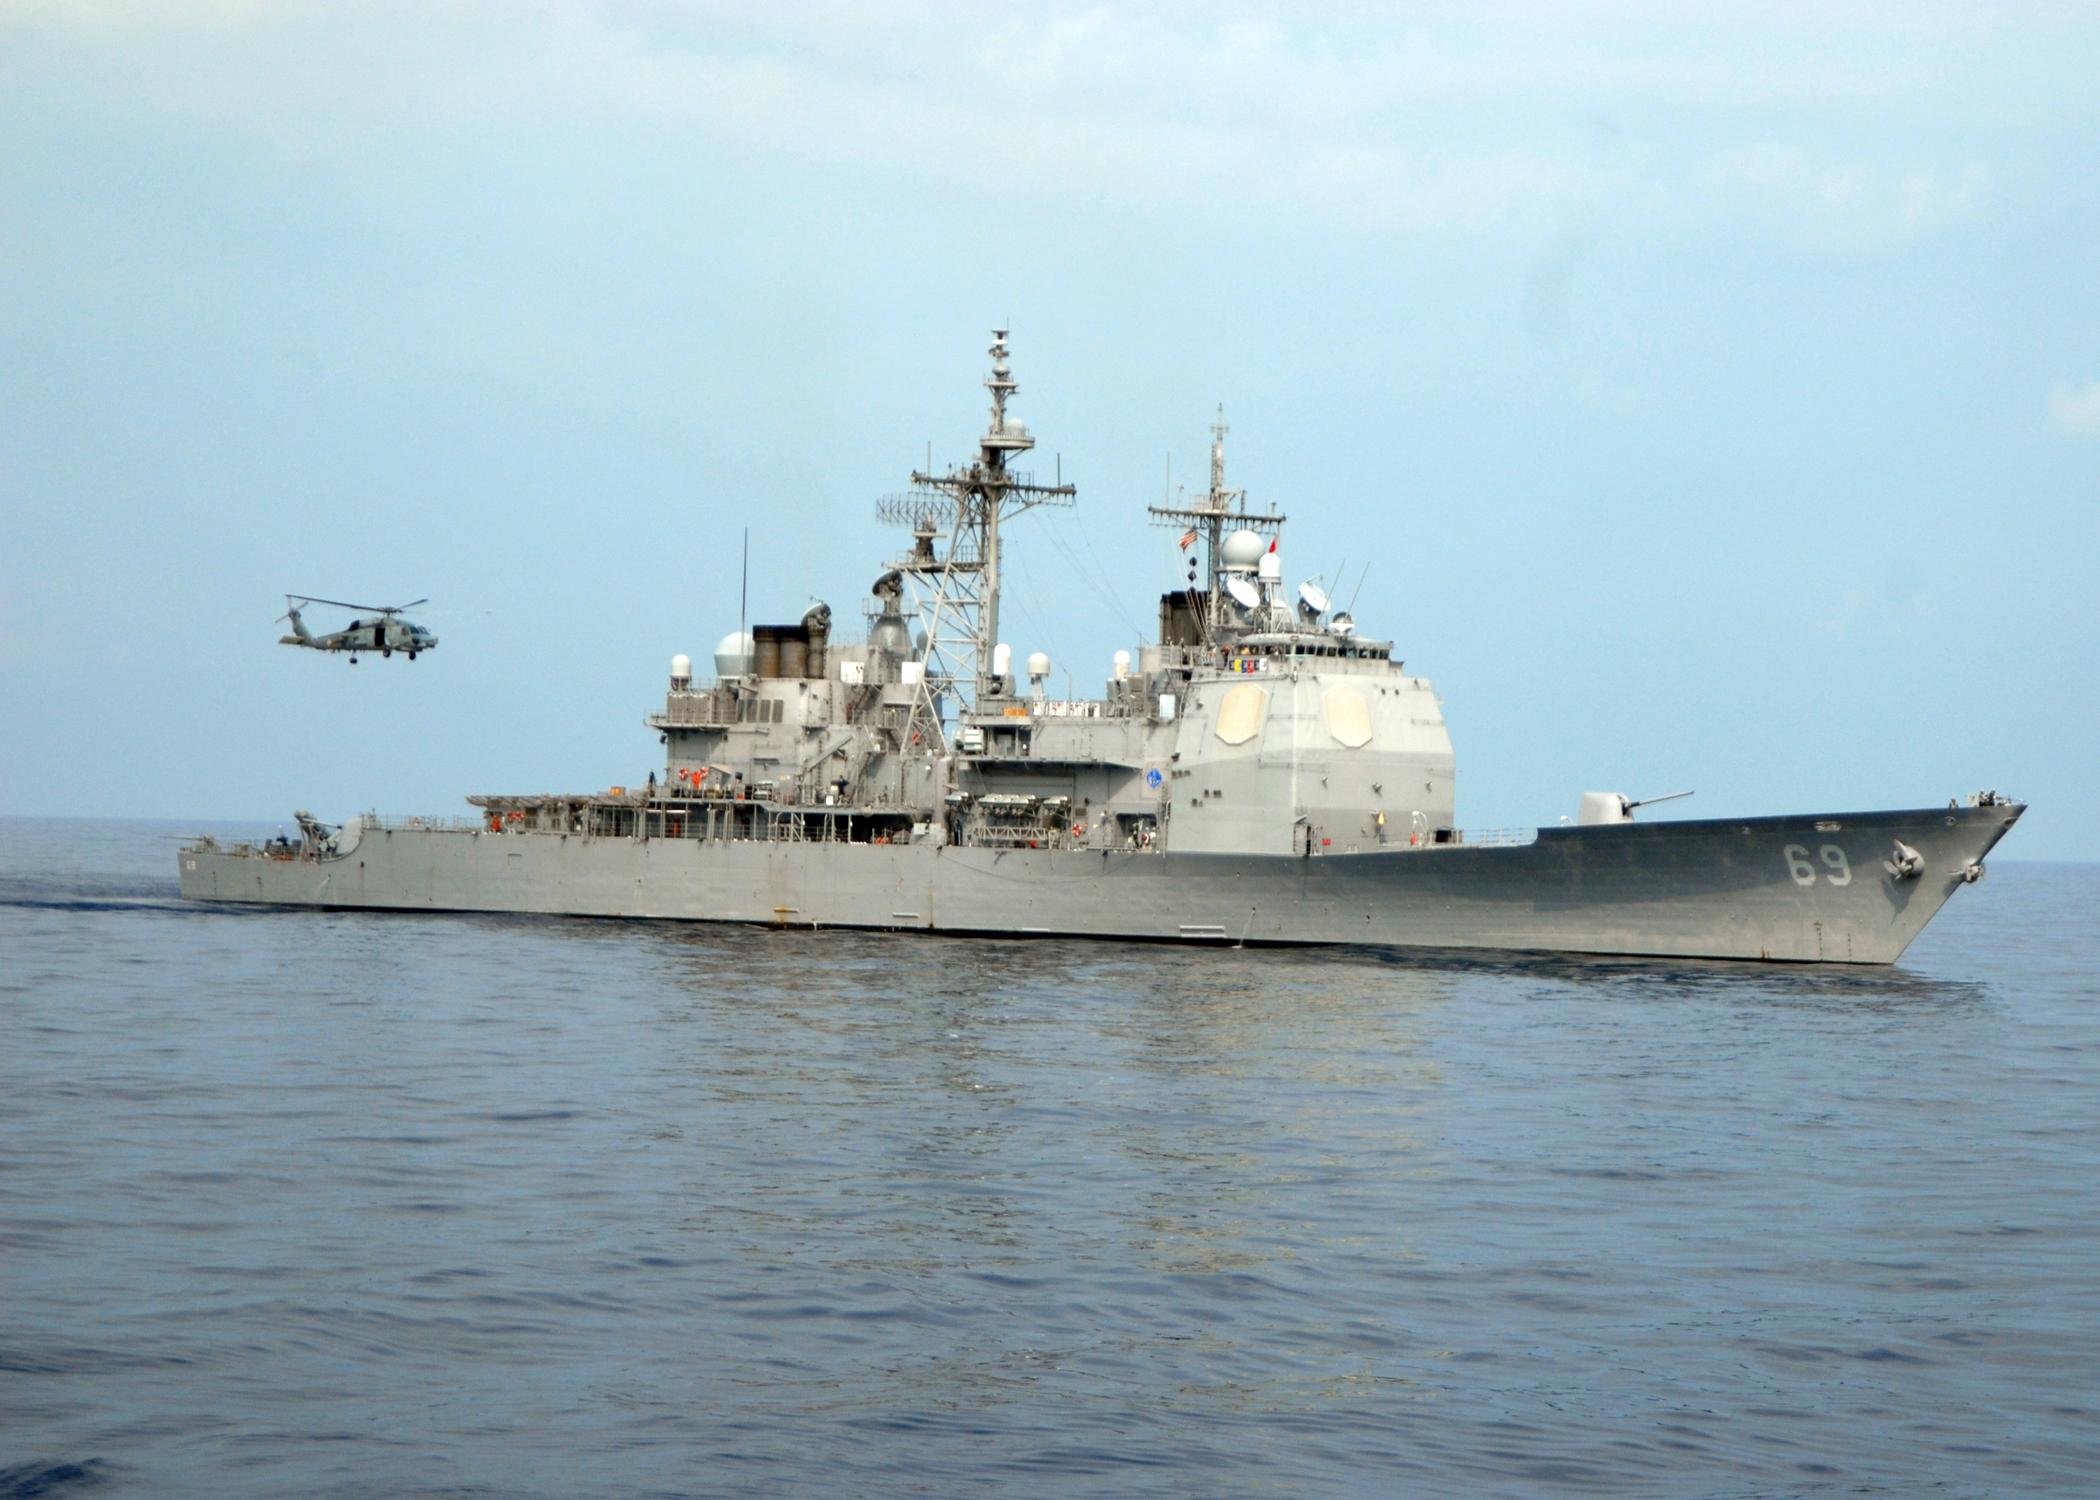 USS VICKSBURG CG-69 Bild: U.S. Navy